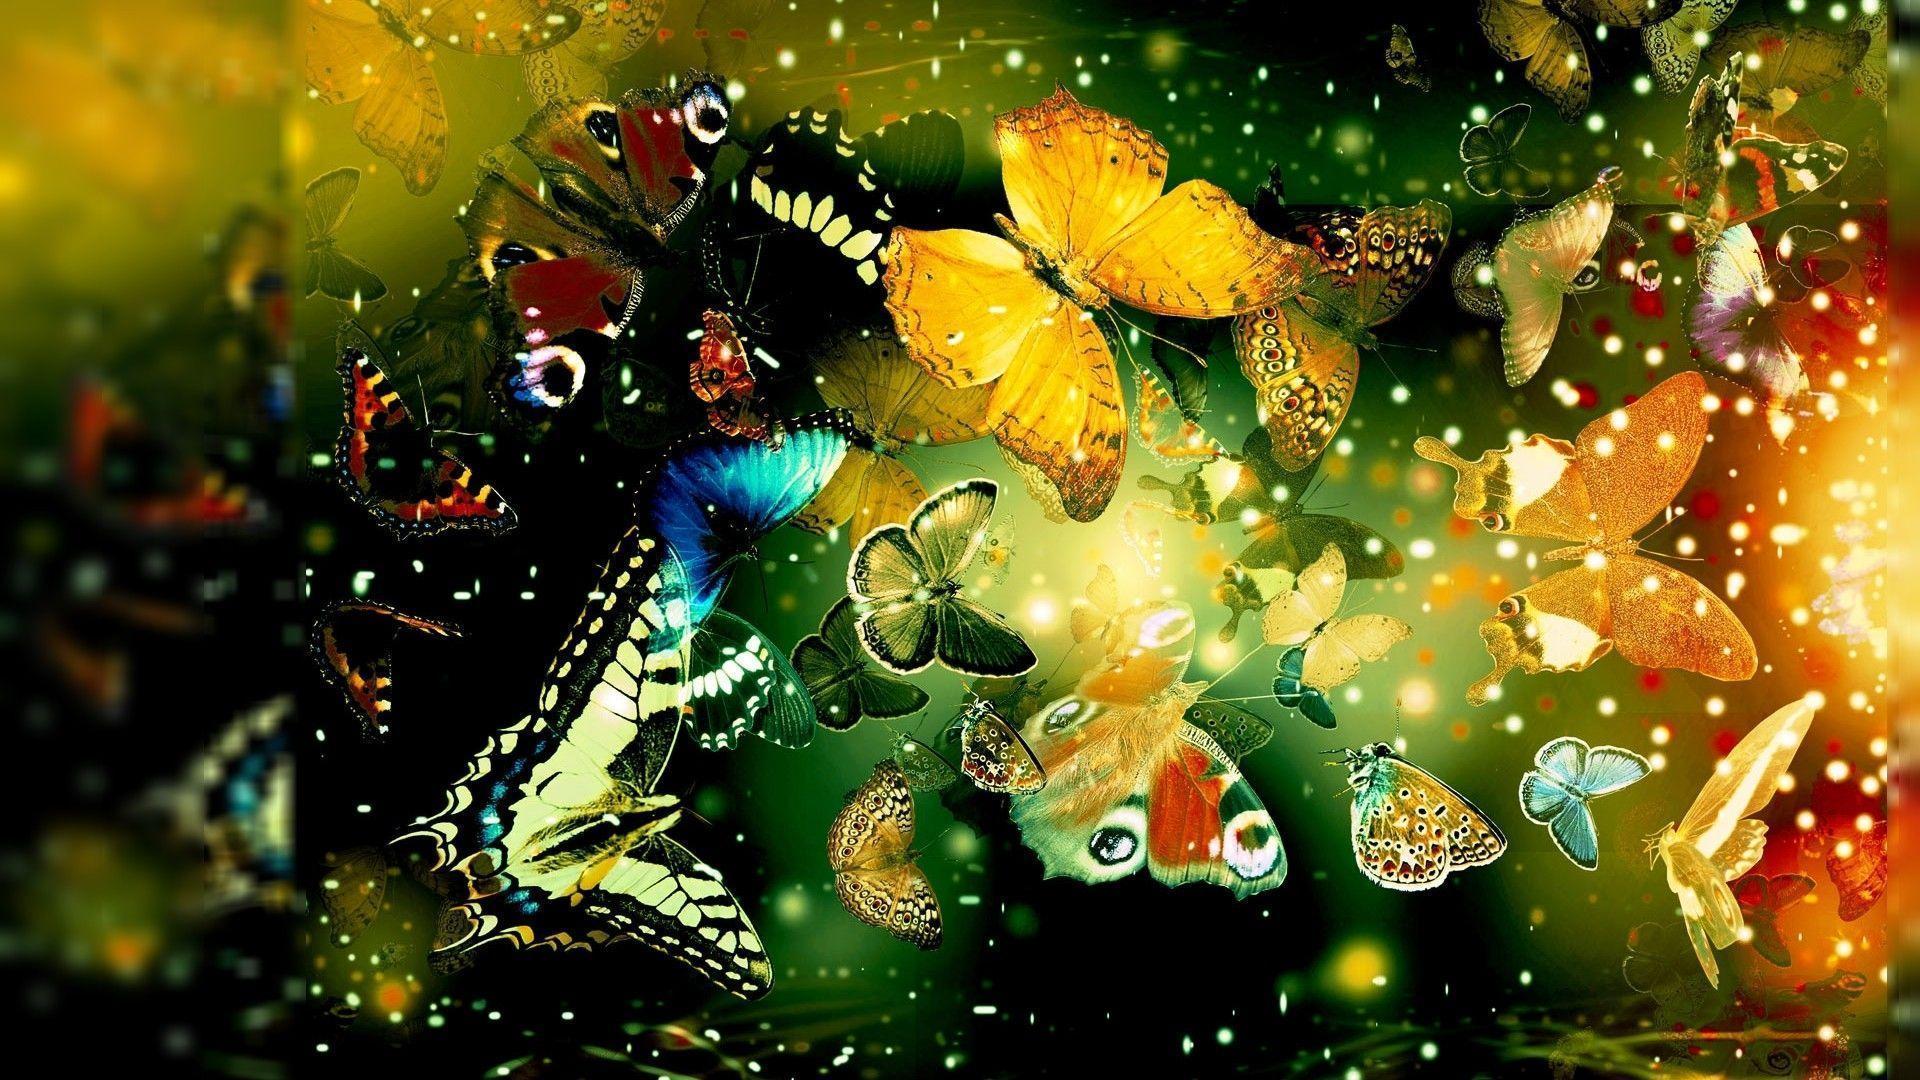 Butterflies Wallpapers Free Download